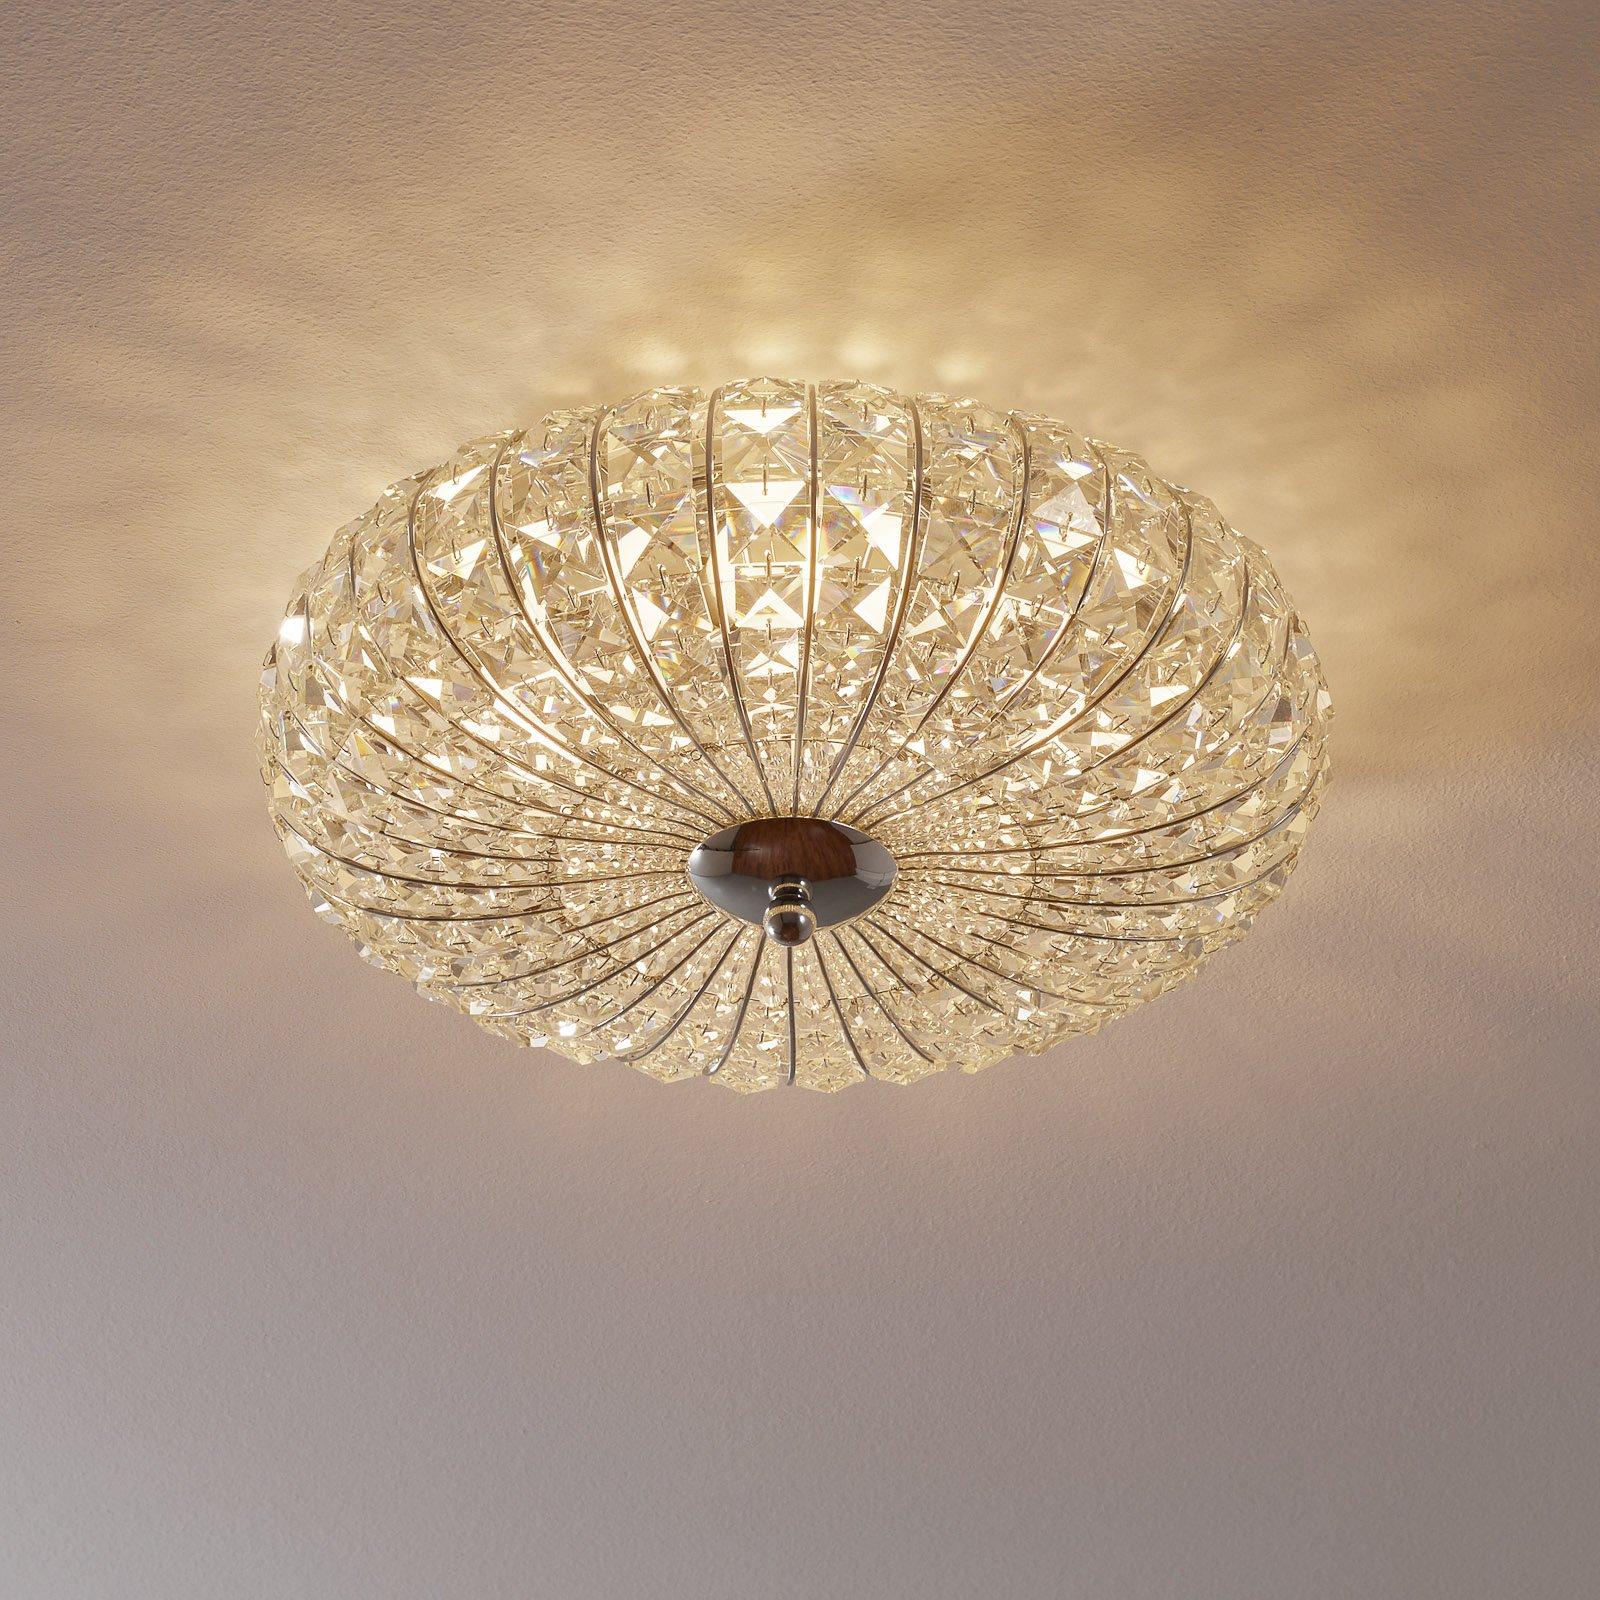 Broche taklampe med krystaller, Ø 40 cm